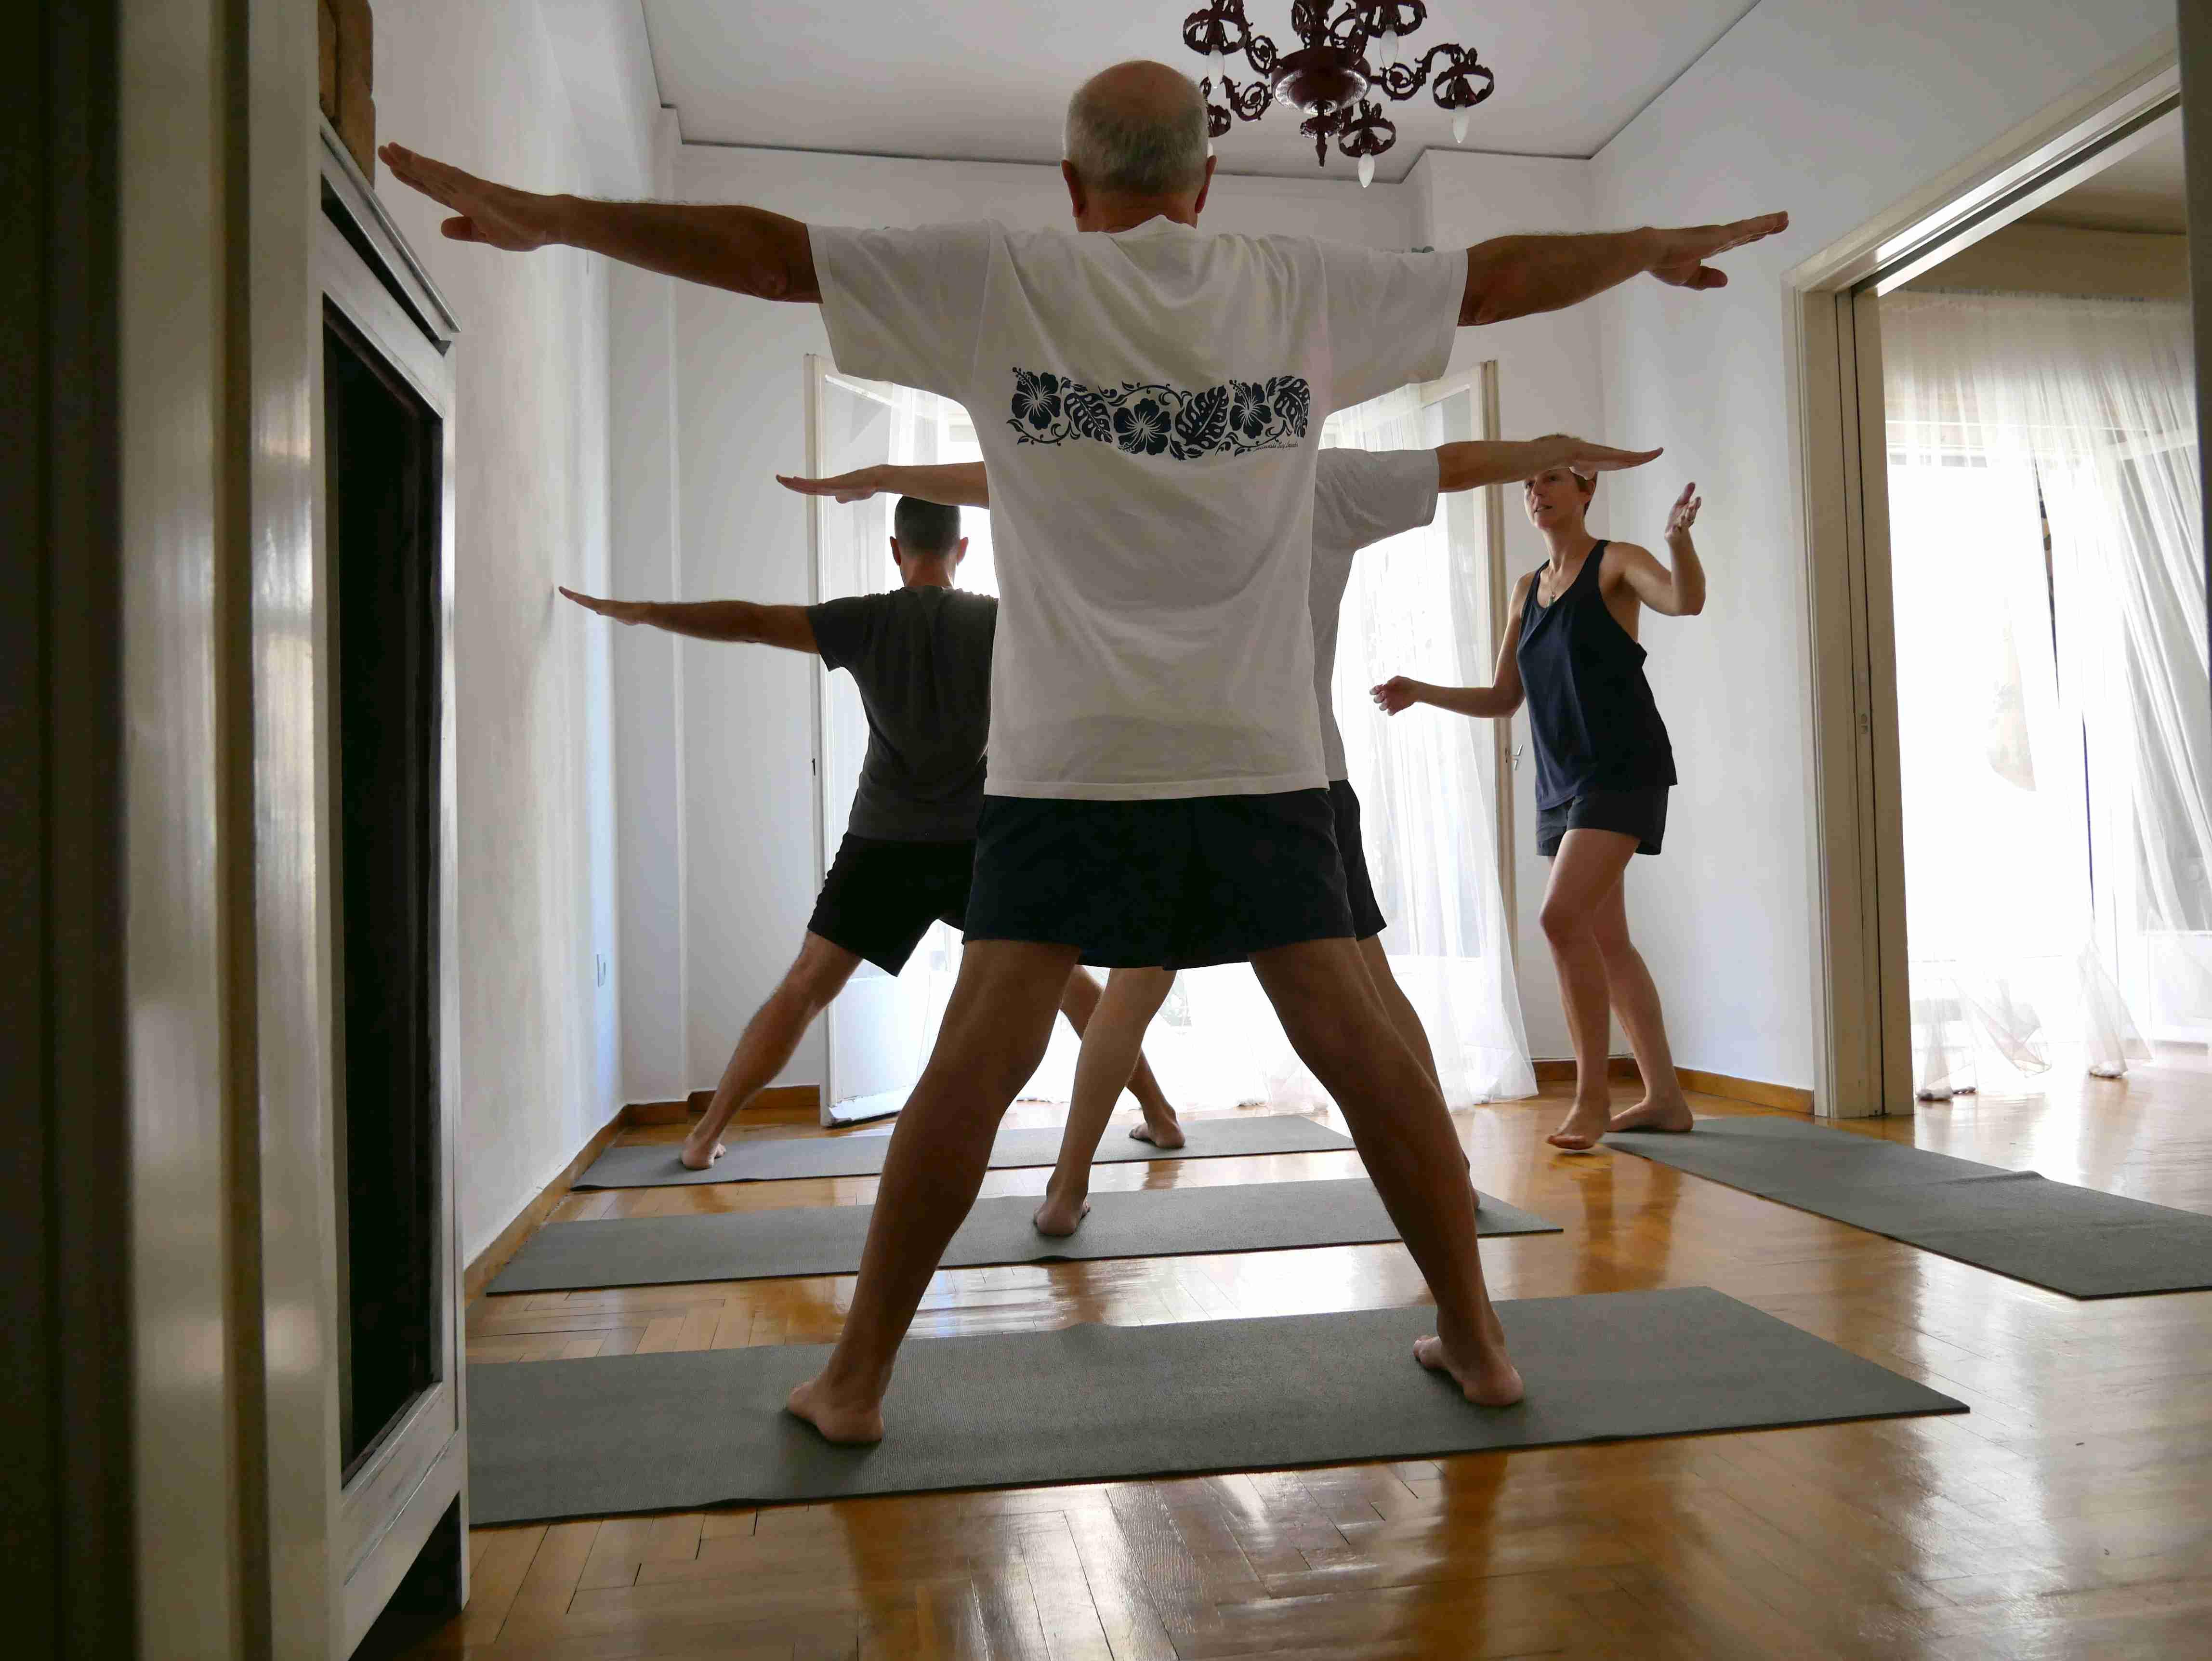 Yoga studio Atenas kundakunda